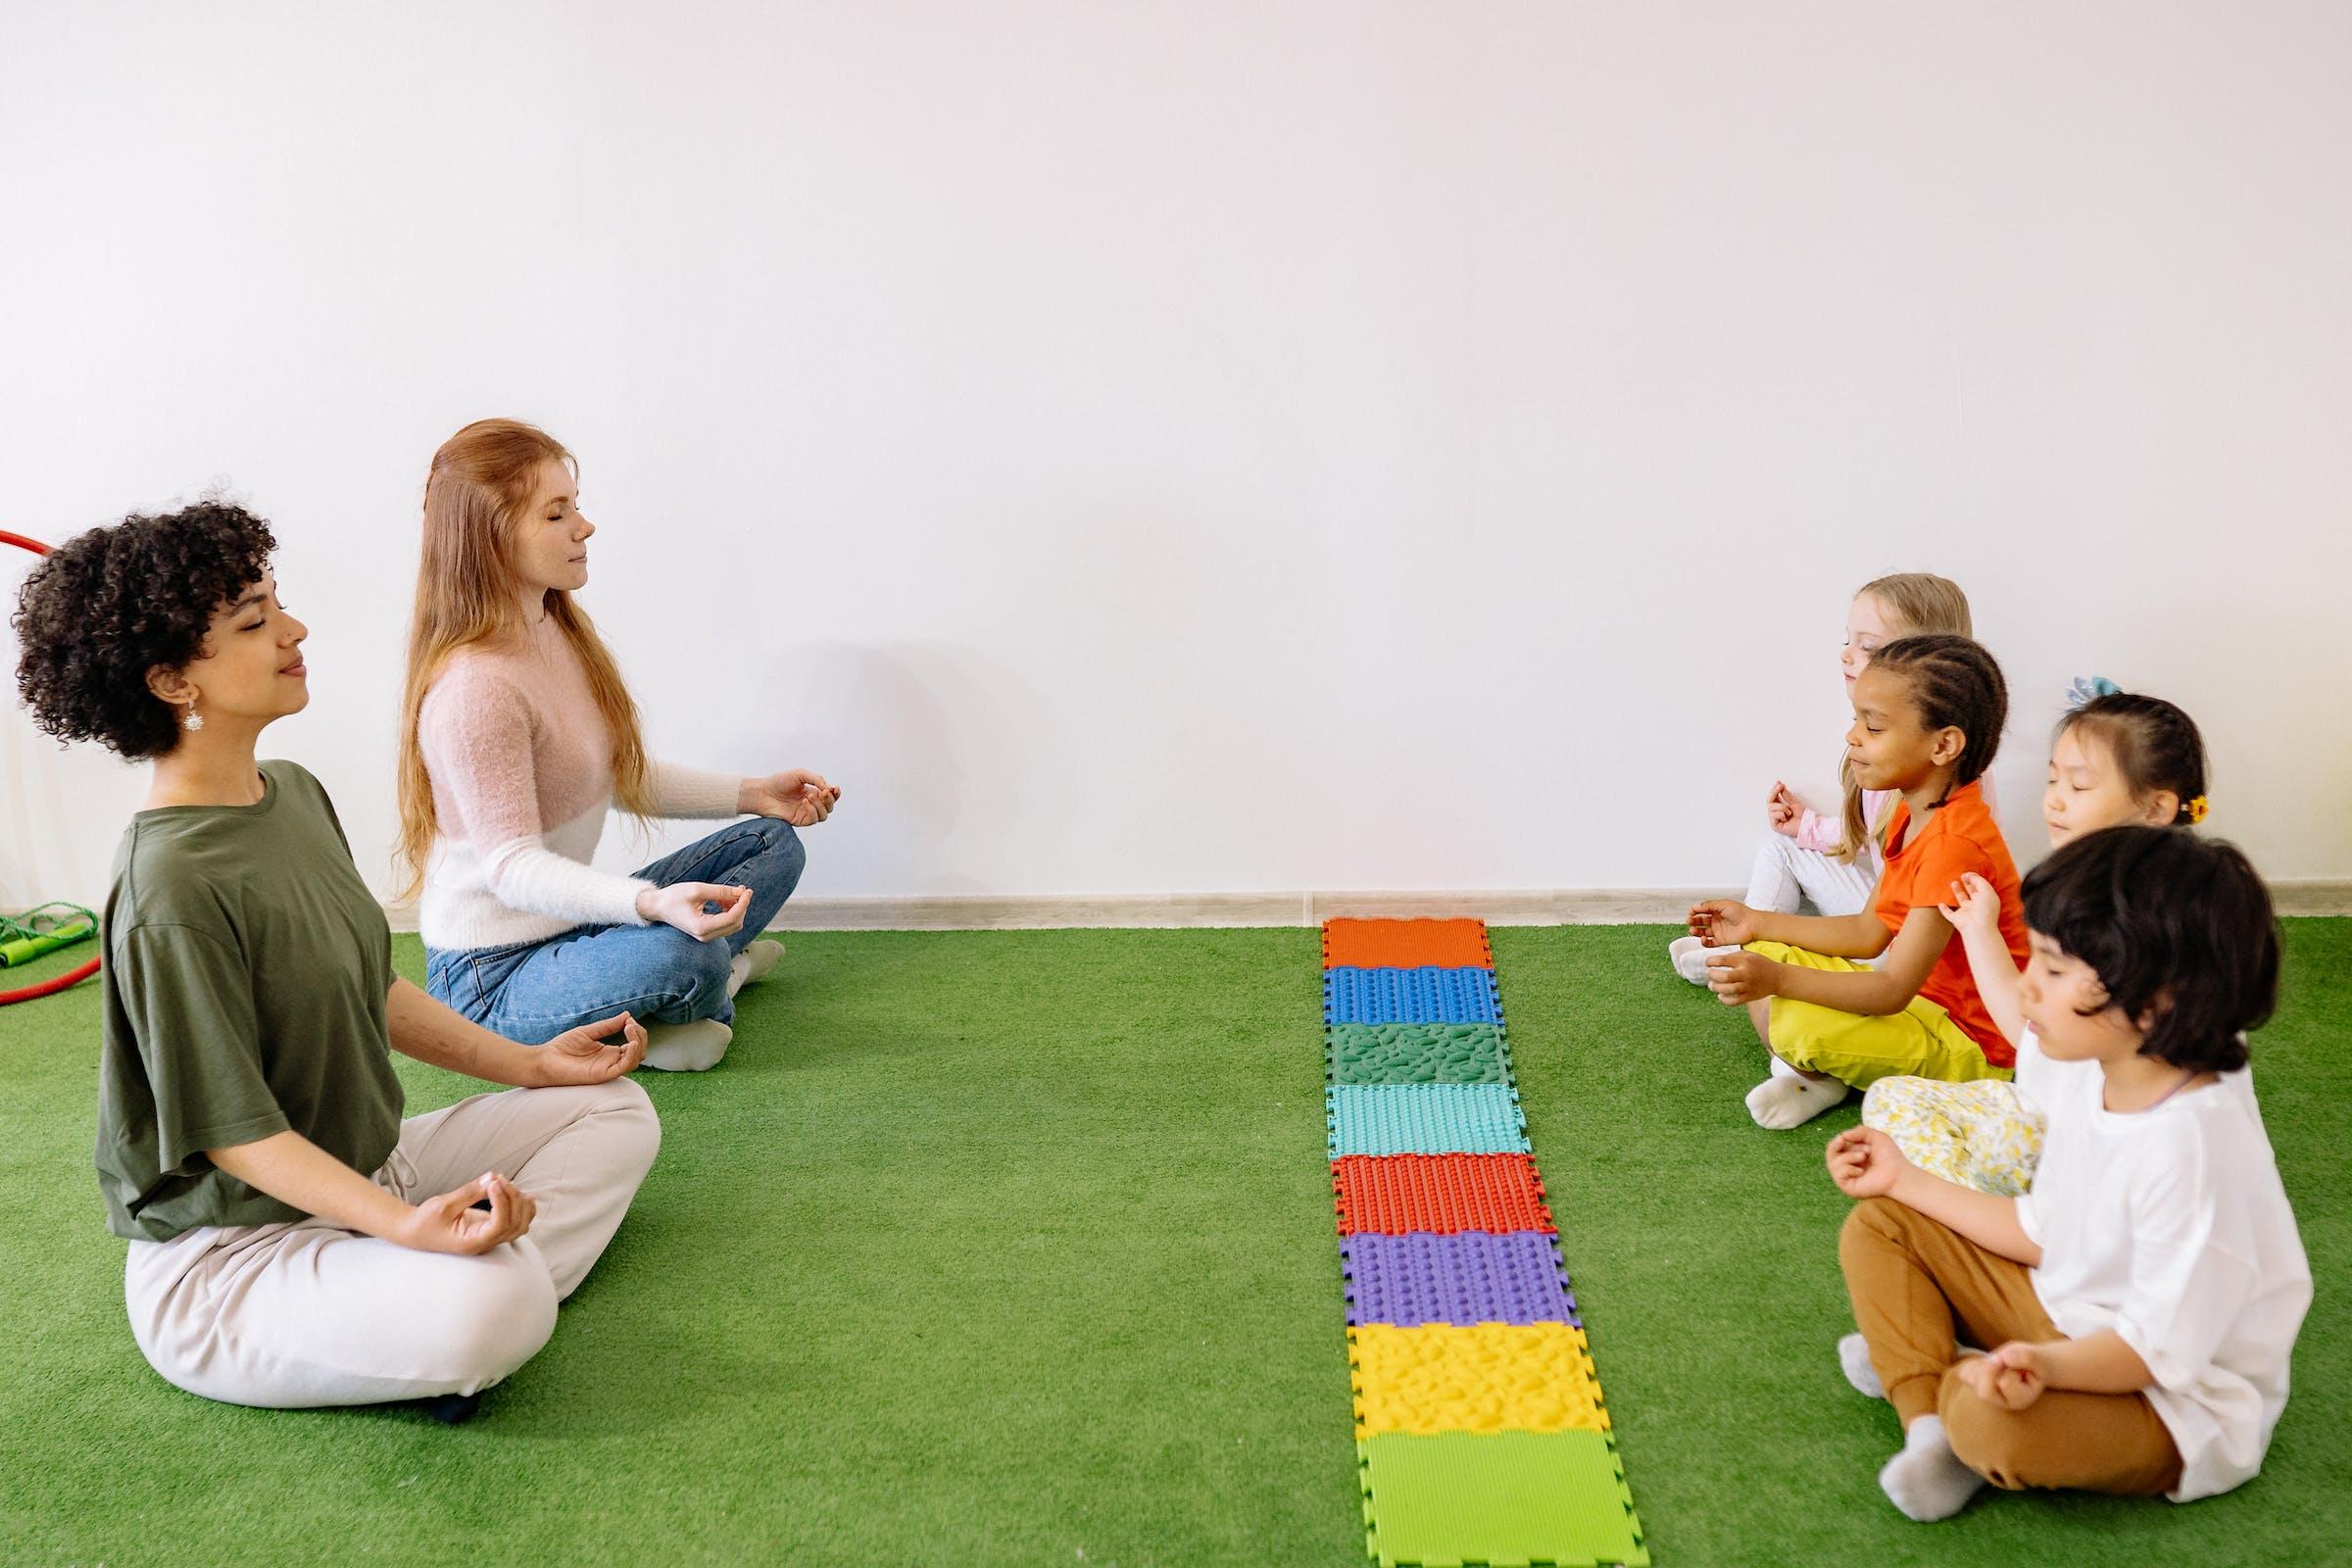 NCCIH Endorses Yoga